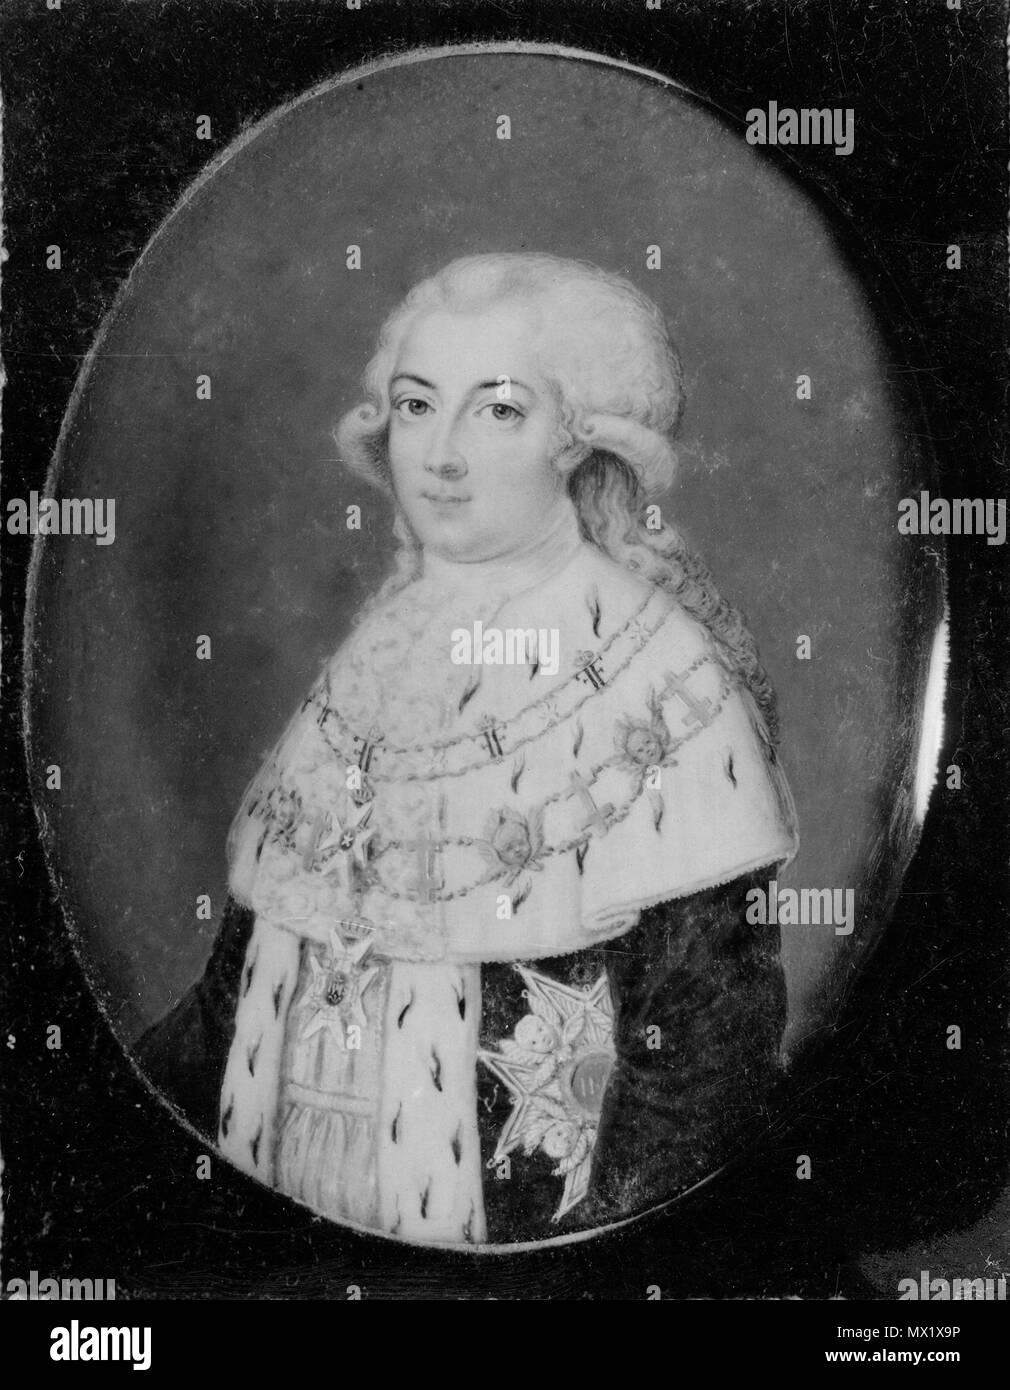 Gustav Adolf Loftman - unam.net